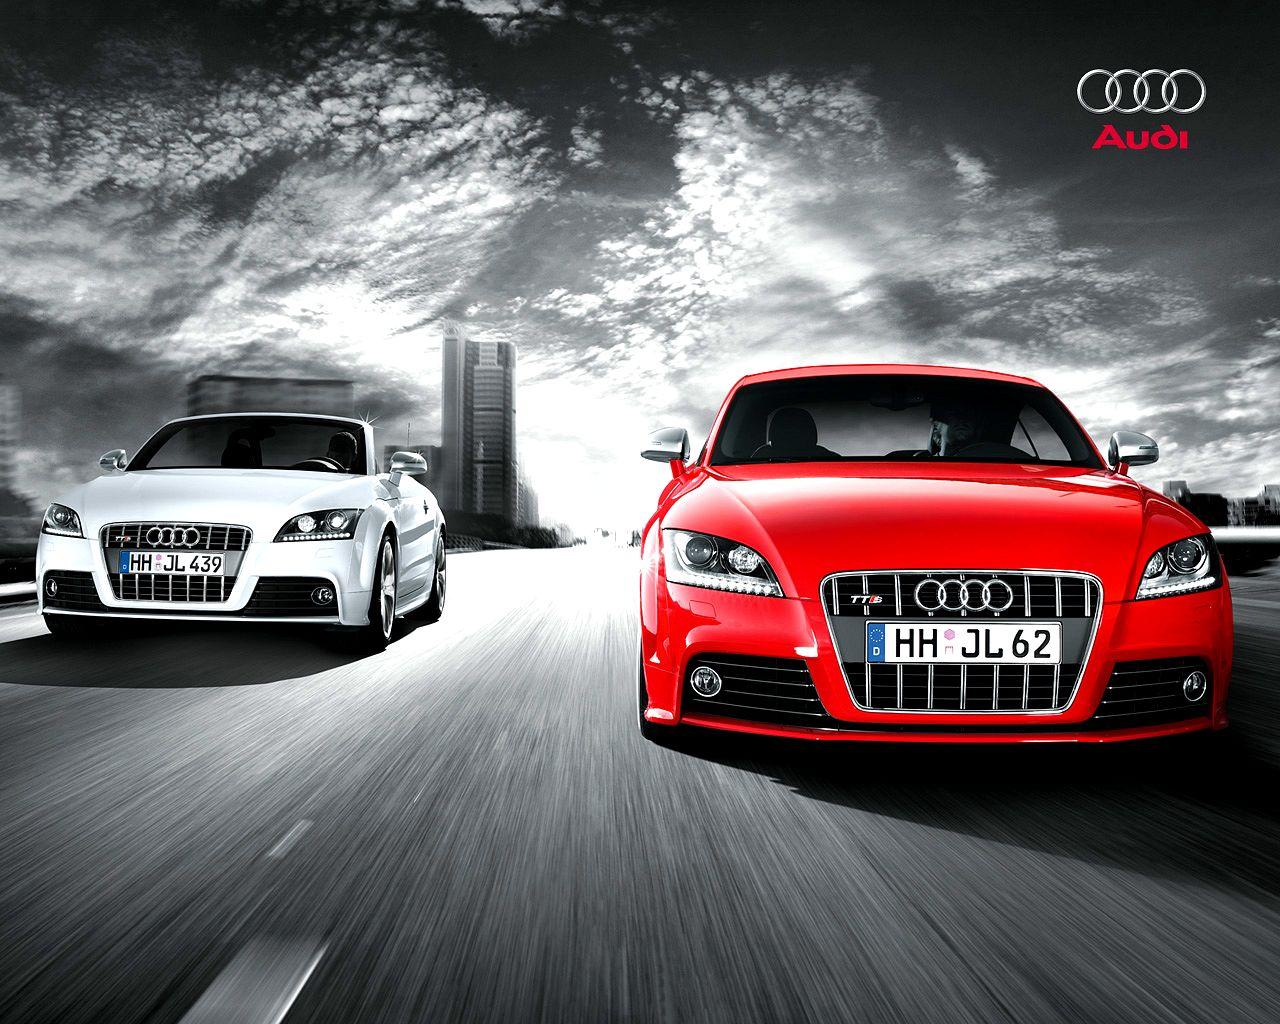 HD Audi Car Wallpapers | Nice Wallpapers